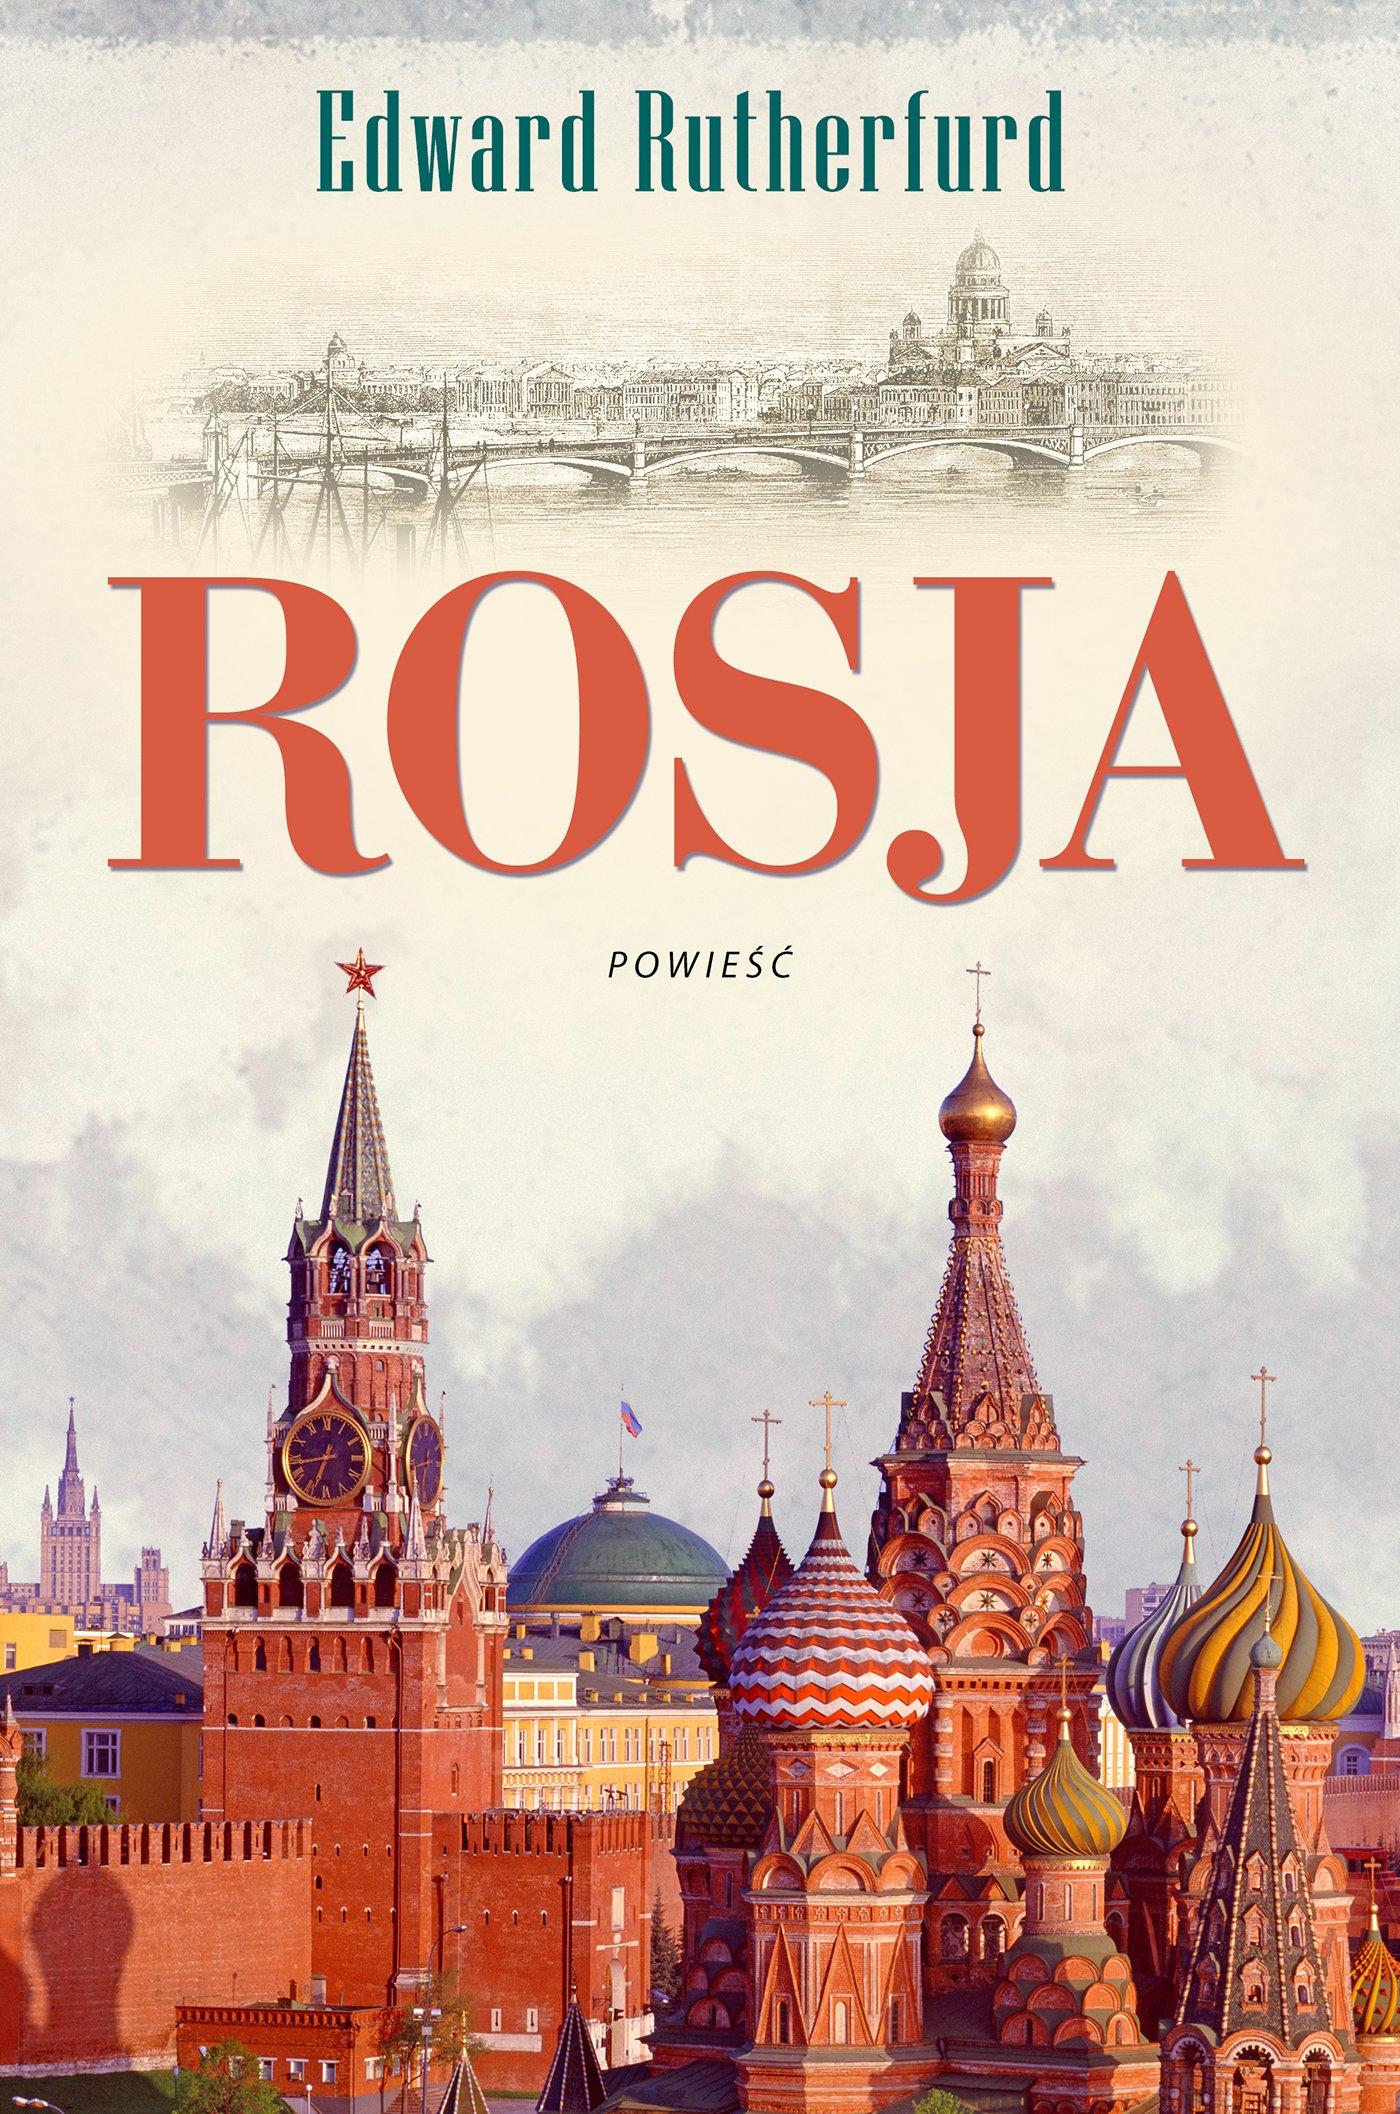 Rosja - Ebook (Książka na Kindle) do pobrania w formacie MOBI